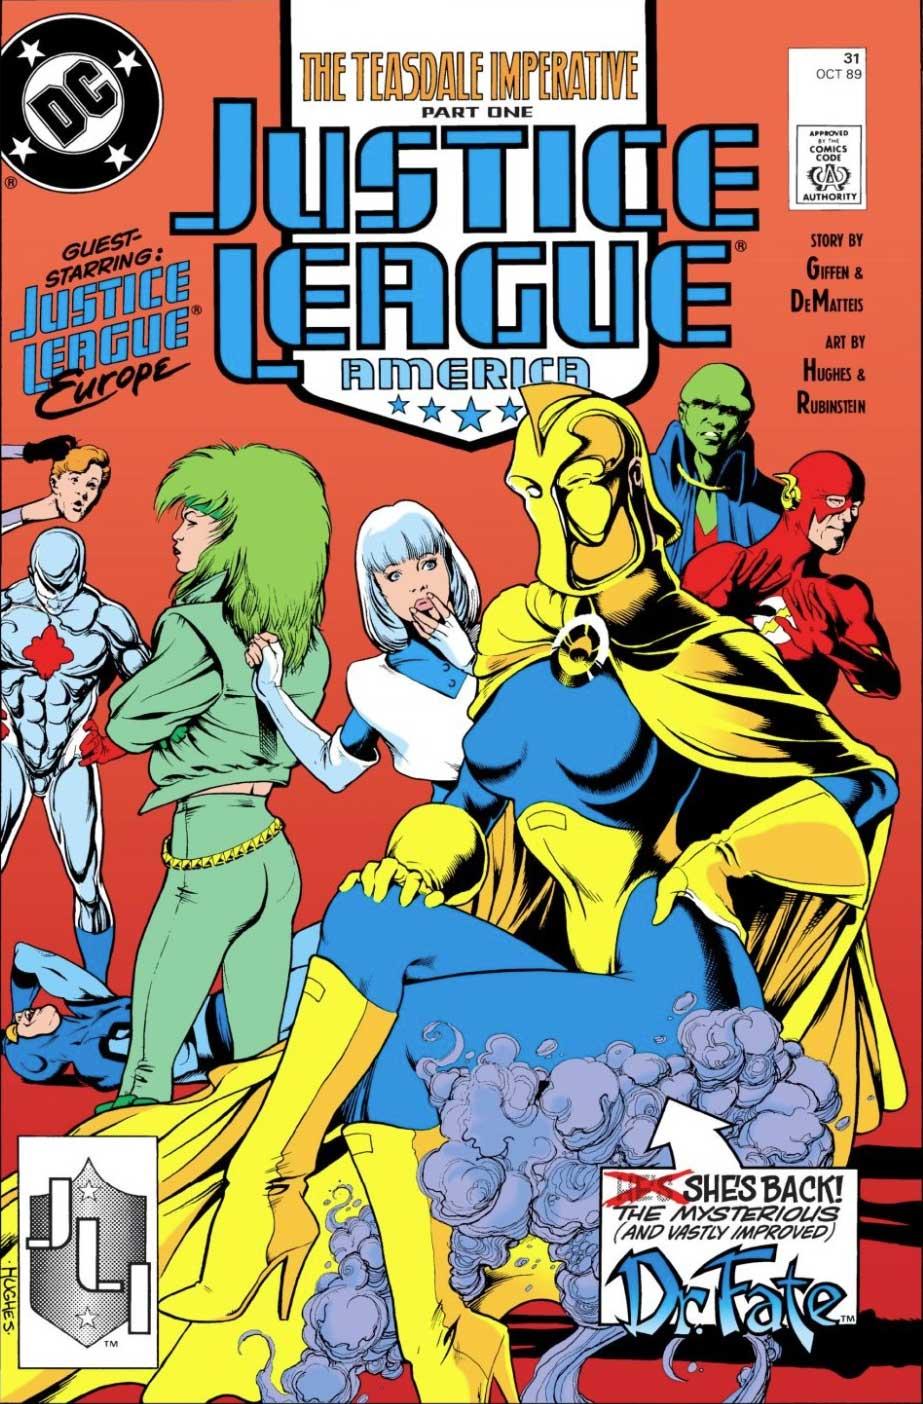 Justice League America #31 cover by Adam Hughes